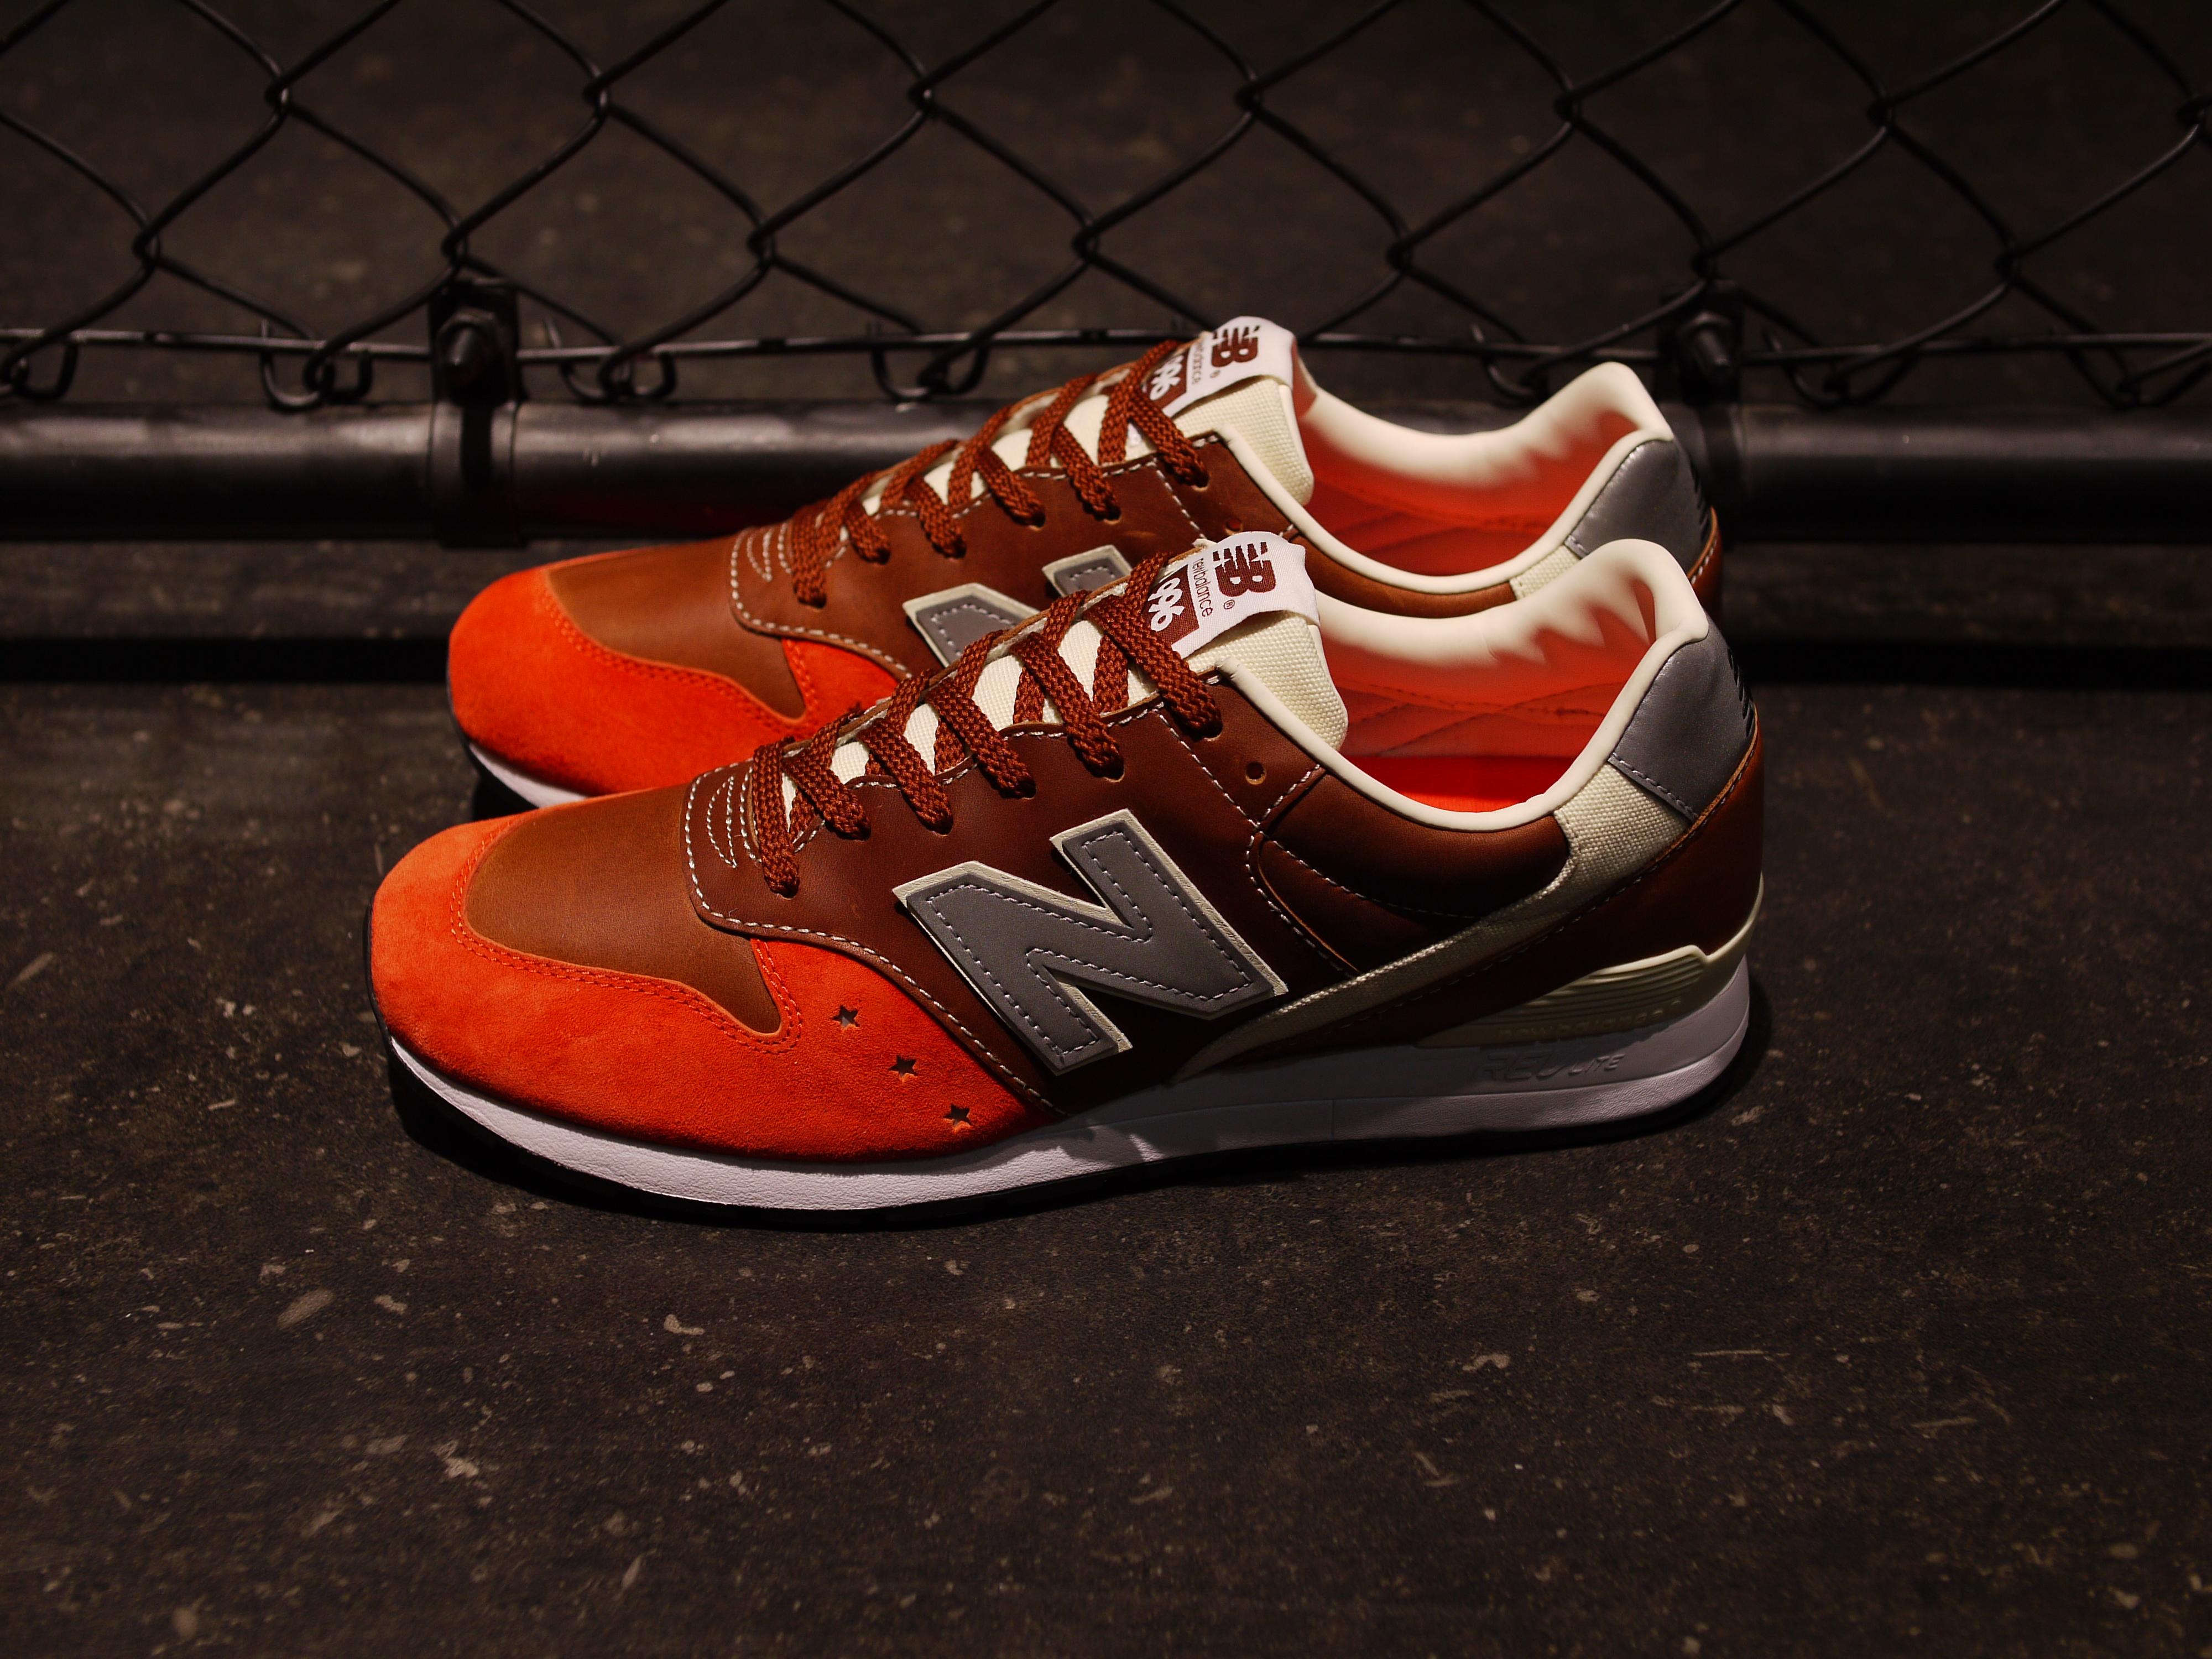 New Balance MRL996 x WHIZ LIMITED x mita sneakers